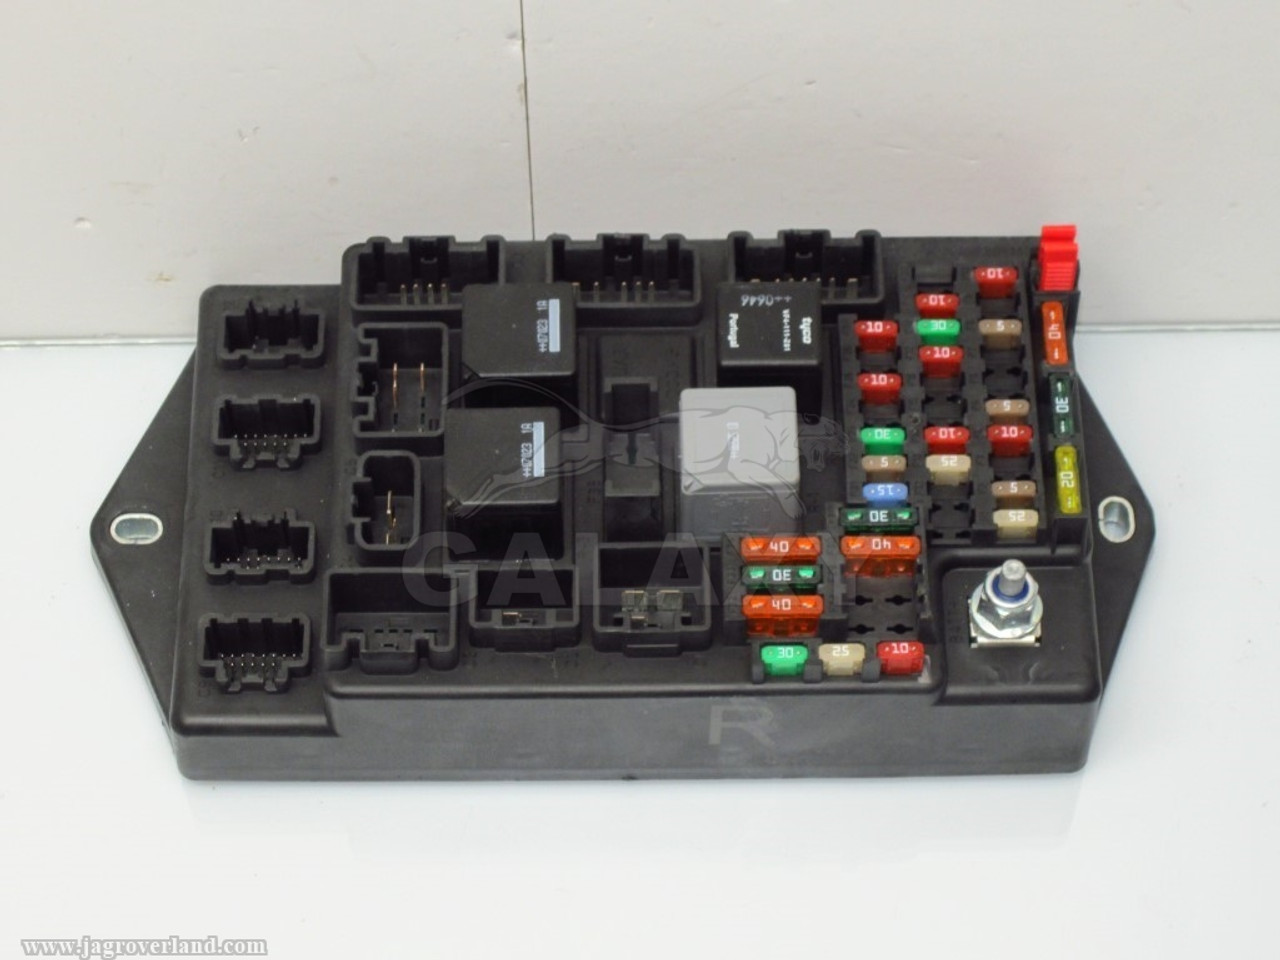 07-09 xk r rear central junction fuse box 6w83-14a073-ch c2p20669